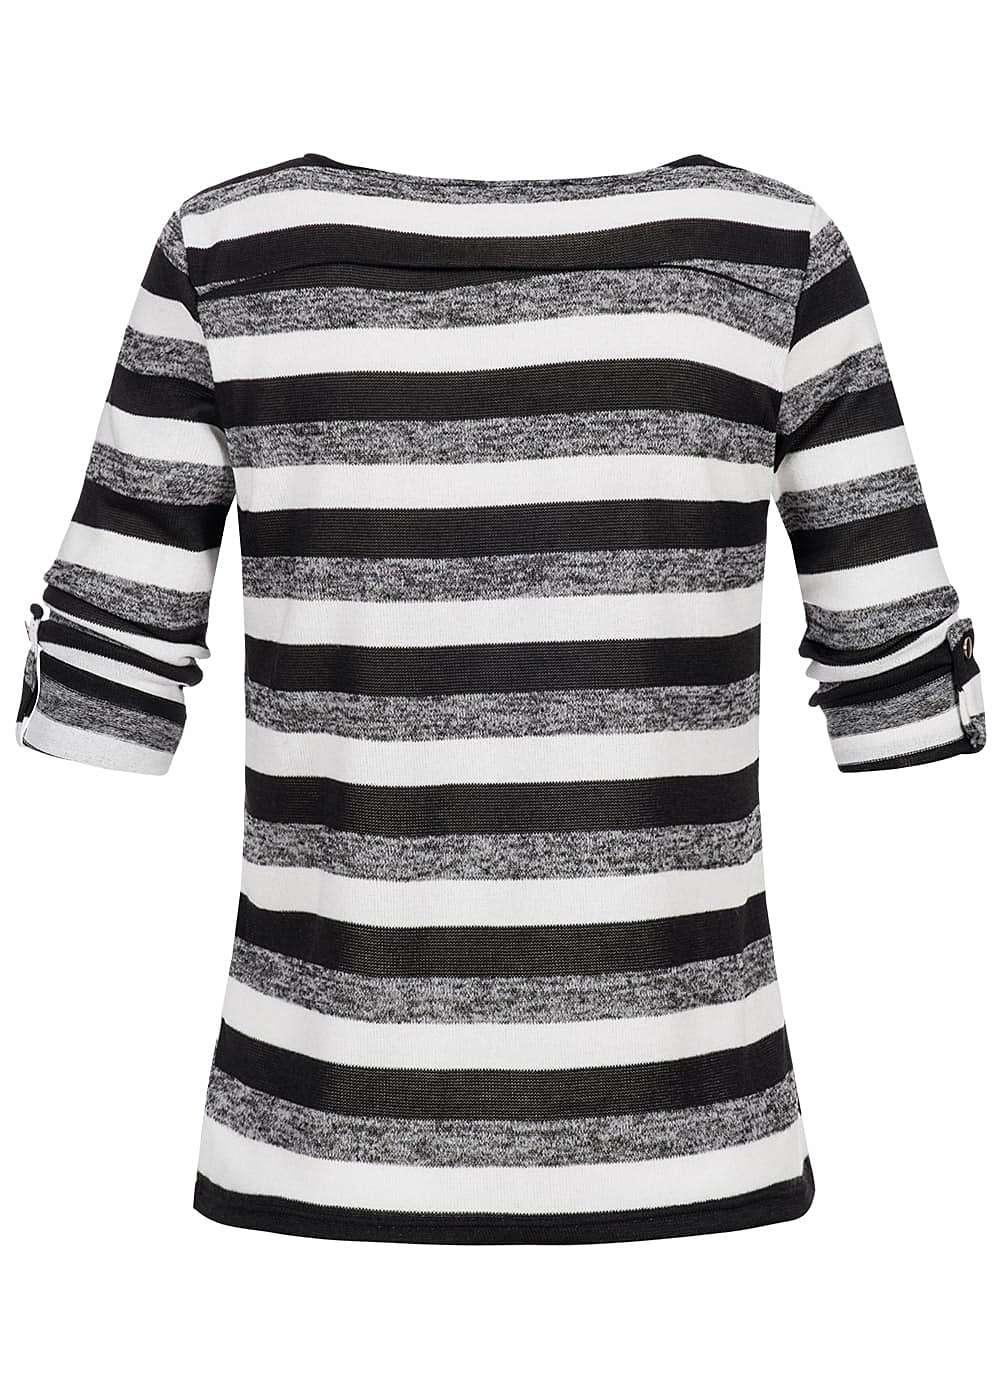 hailys damen 3 4 shirt deko turn up rmel gestreift schwarz weiss. Black Bedroom Furniture Sets. Home Design Ideas